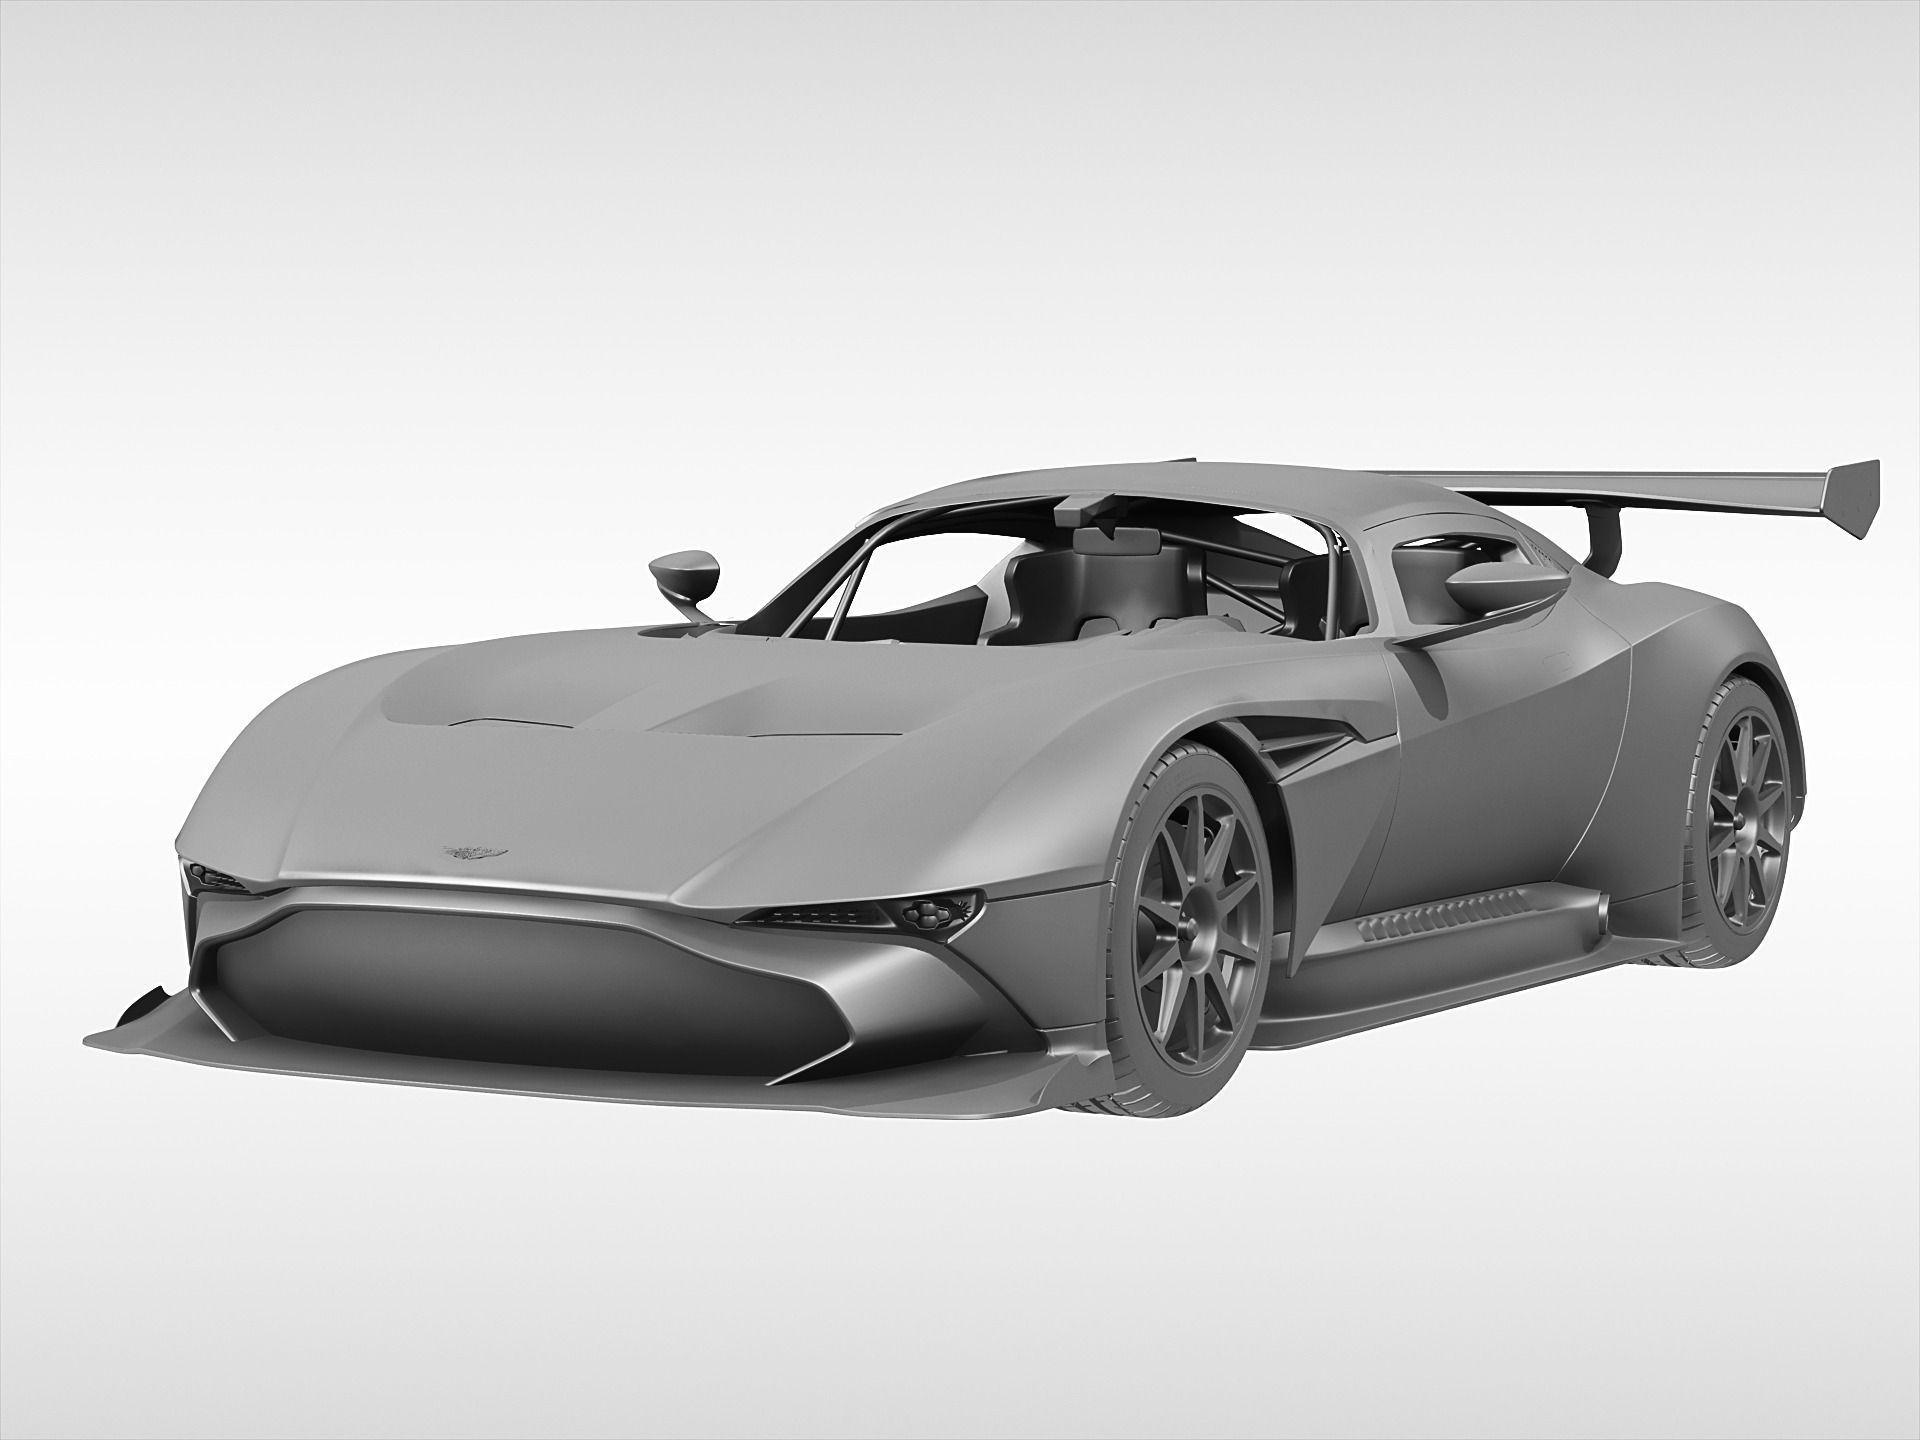 ... Aston Martin Vulcan 2016 3d Model Max Obj 3ds Fbx C4d Ma Mb 8 ...